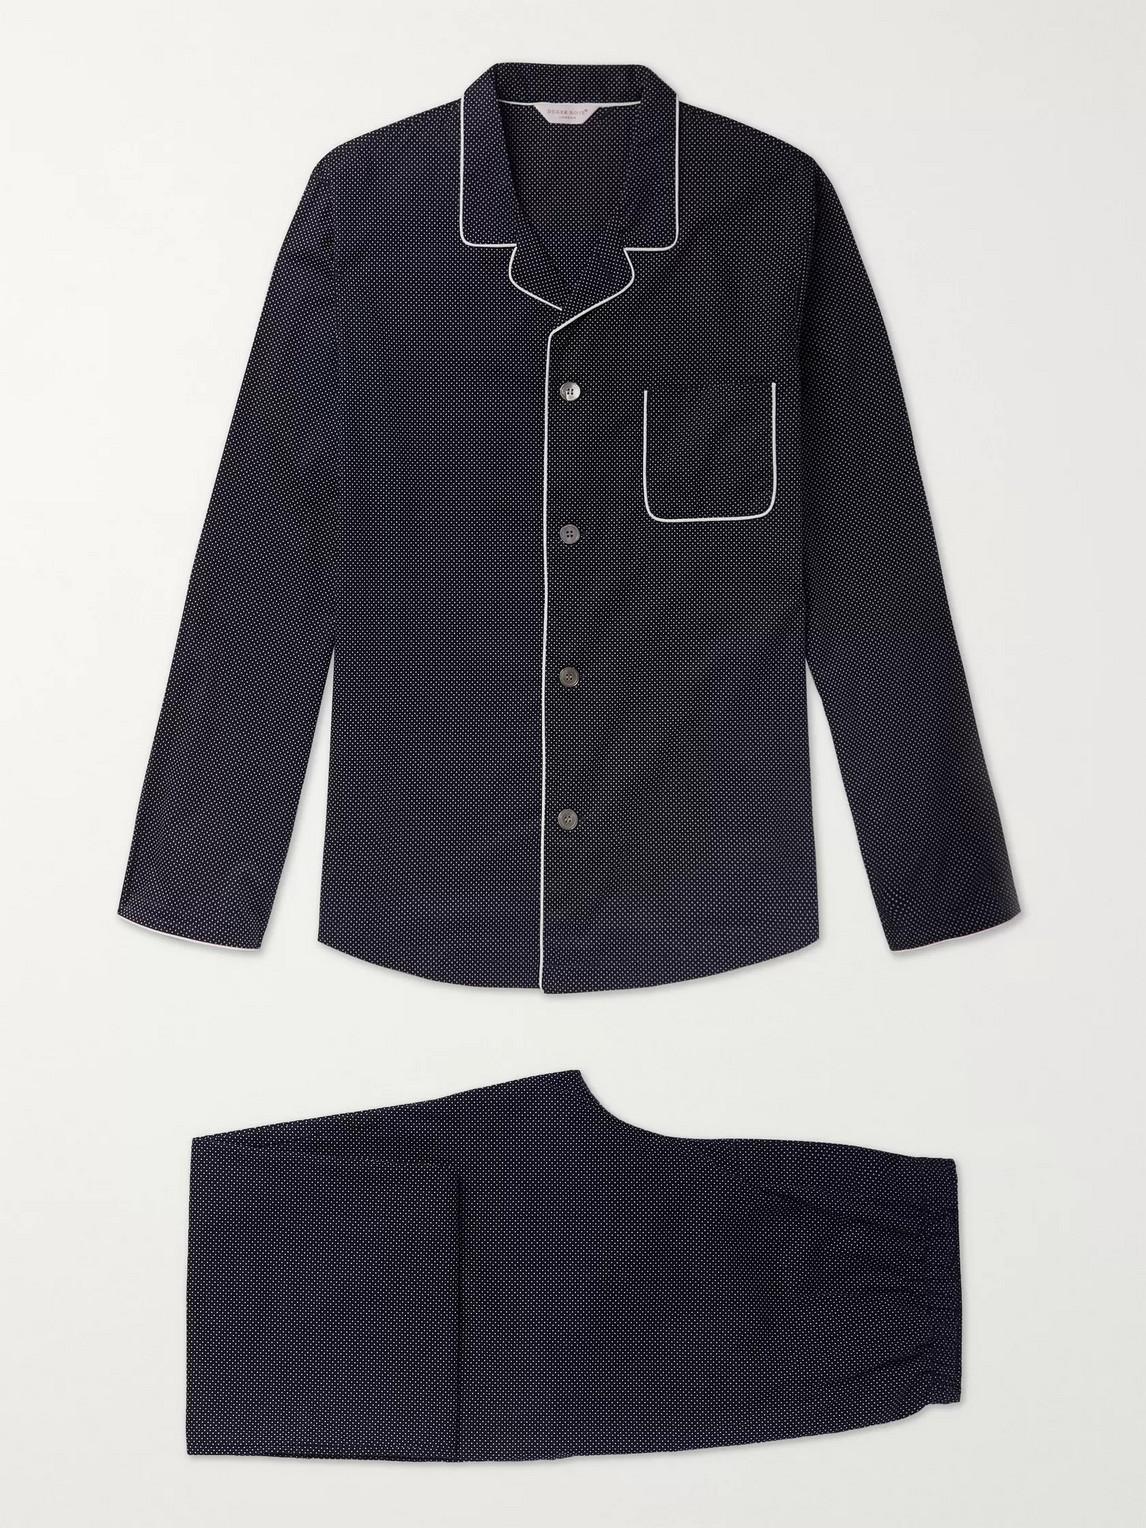 derek rose - plaza 21 piped cotton-poplin pyjama set - blue - s - men